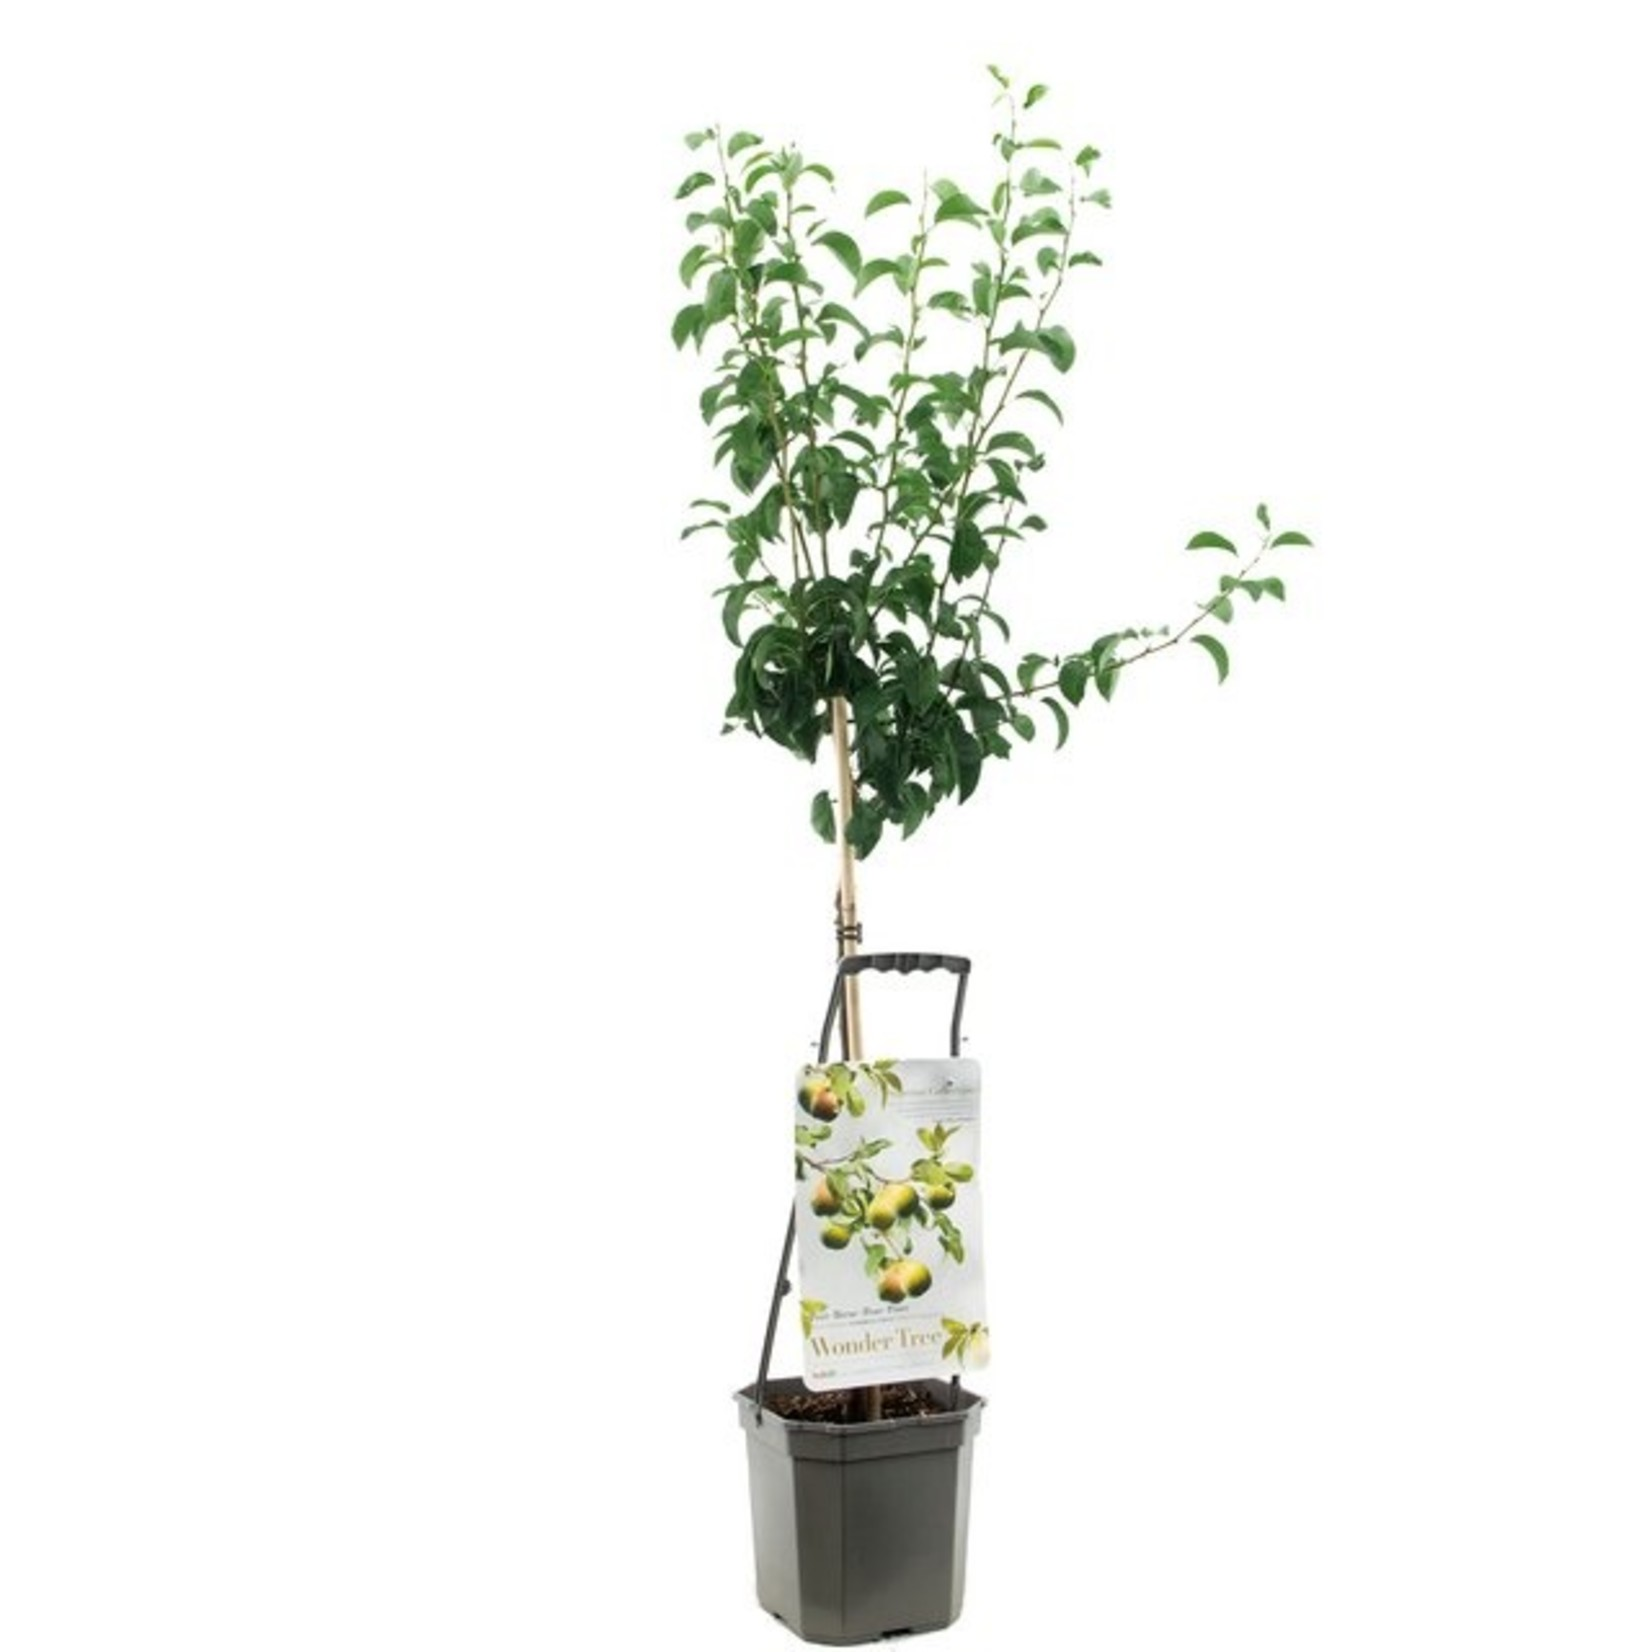 Wondertree Pyrus 'Doyenne du Comice' (handpeer)